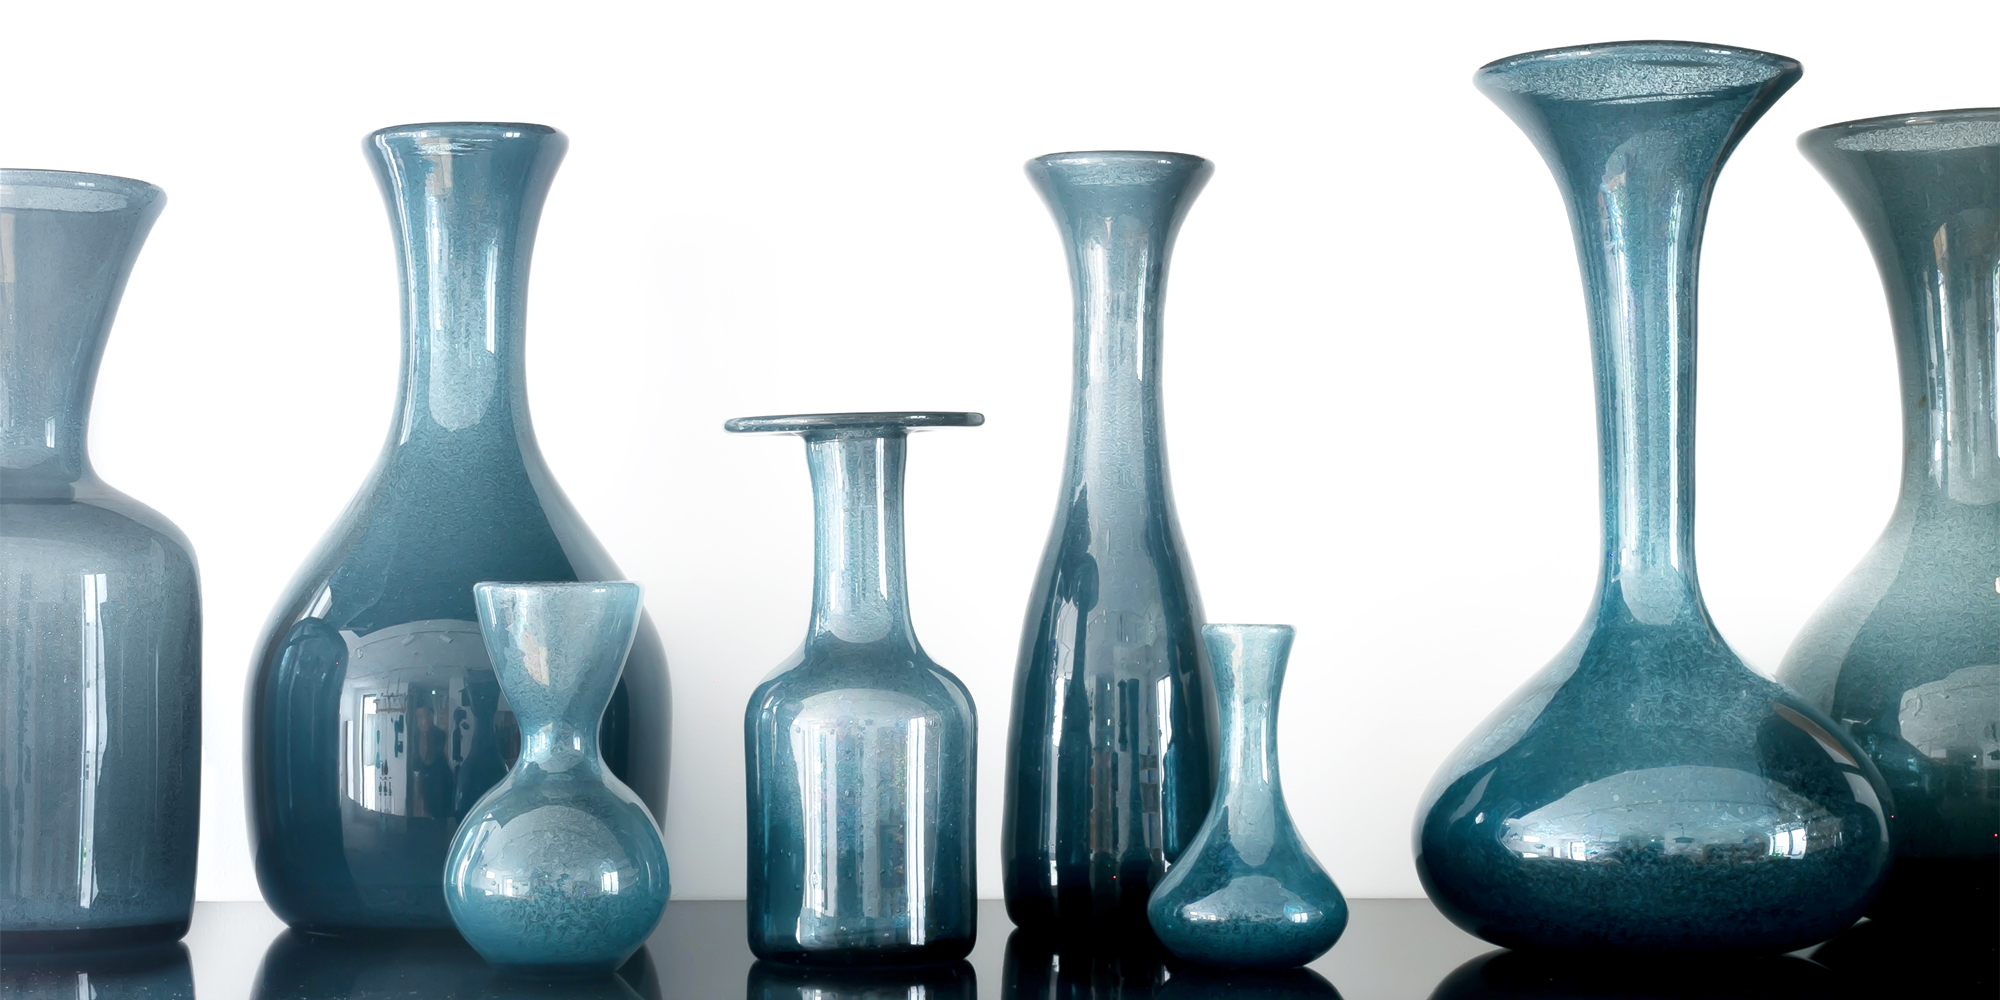 erik hoglund,エリック・ホグラン,boda,kosta boda,ガラス工芸,北欧